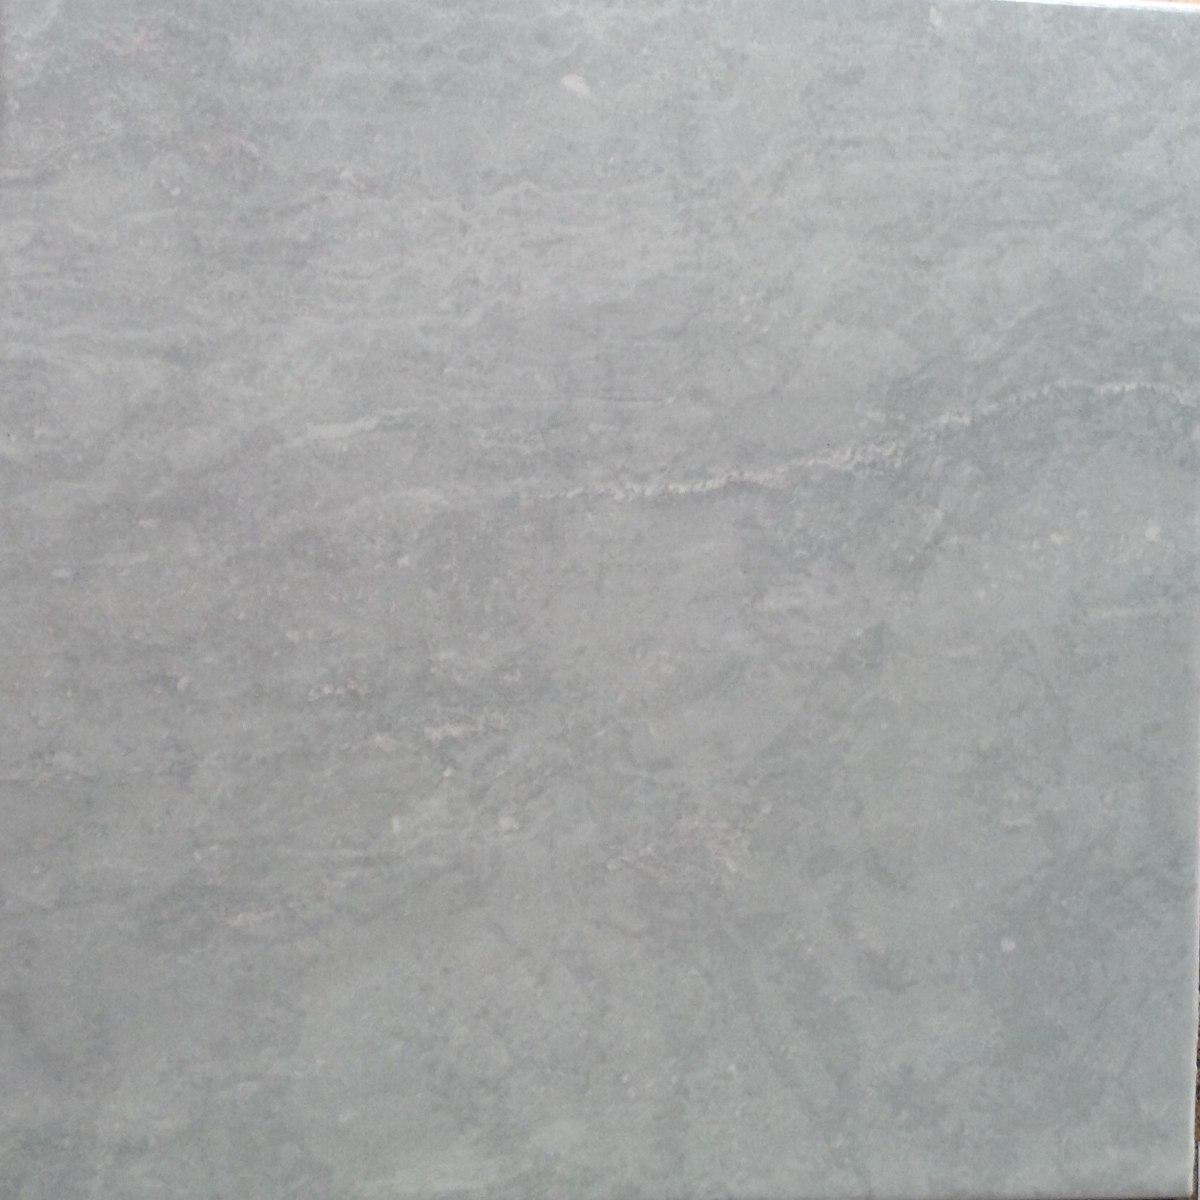 Cer mica charlotte gris pizarra 32x32 para pared y o piso - Papel de pared gris ...